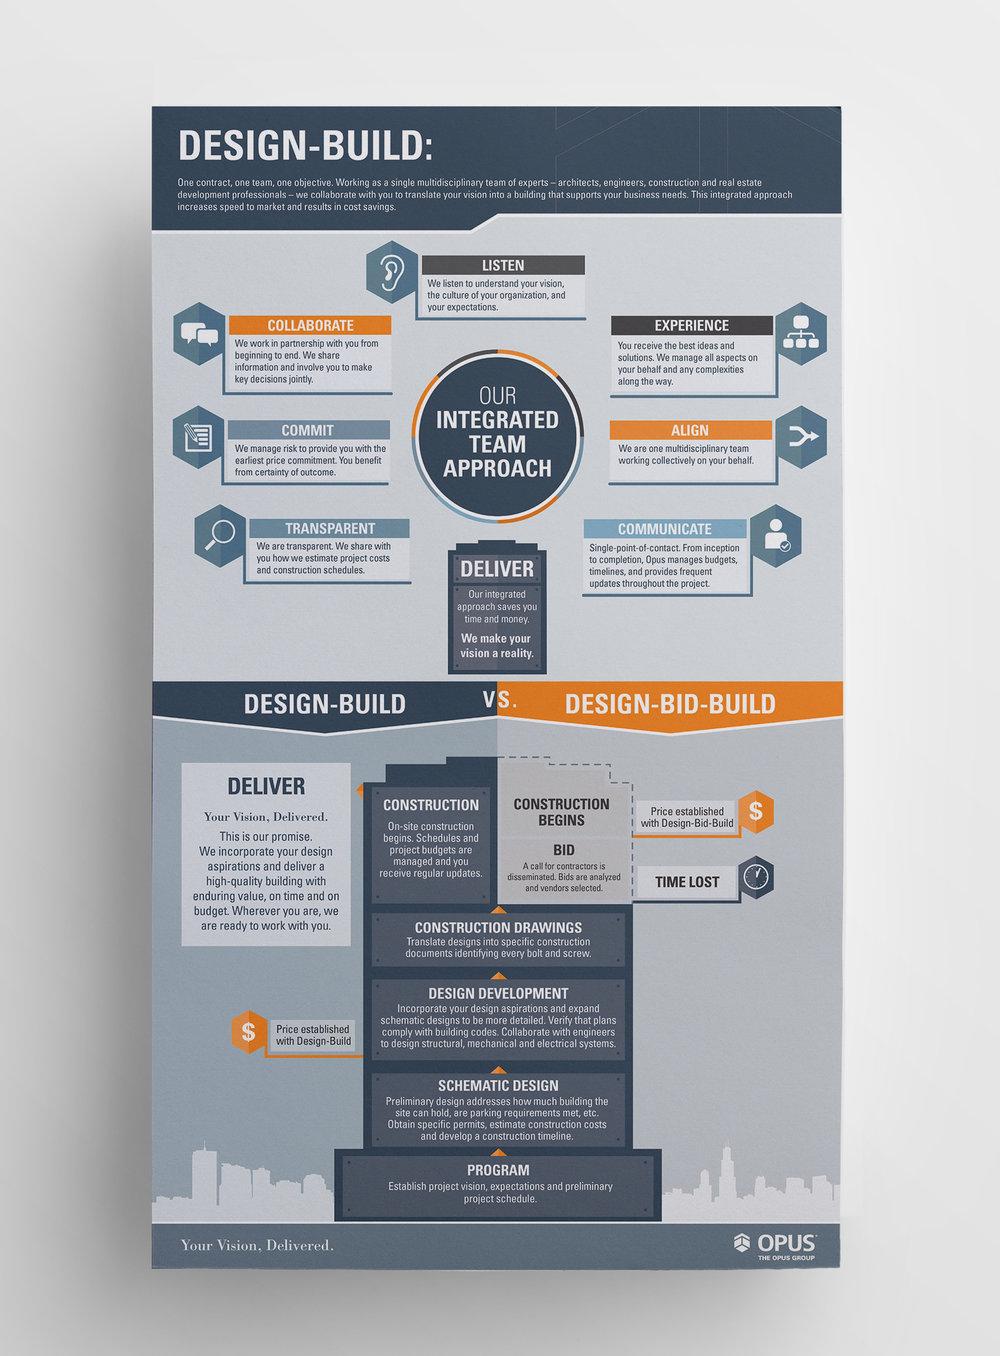 Opus_infographic.jpg